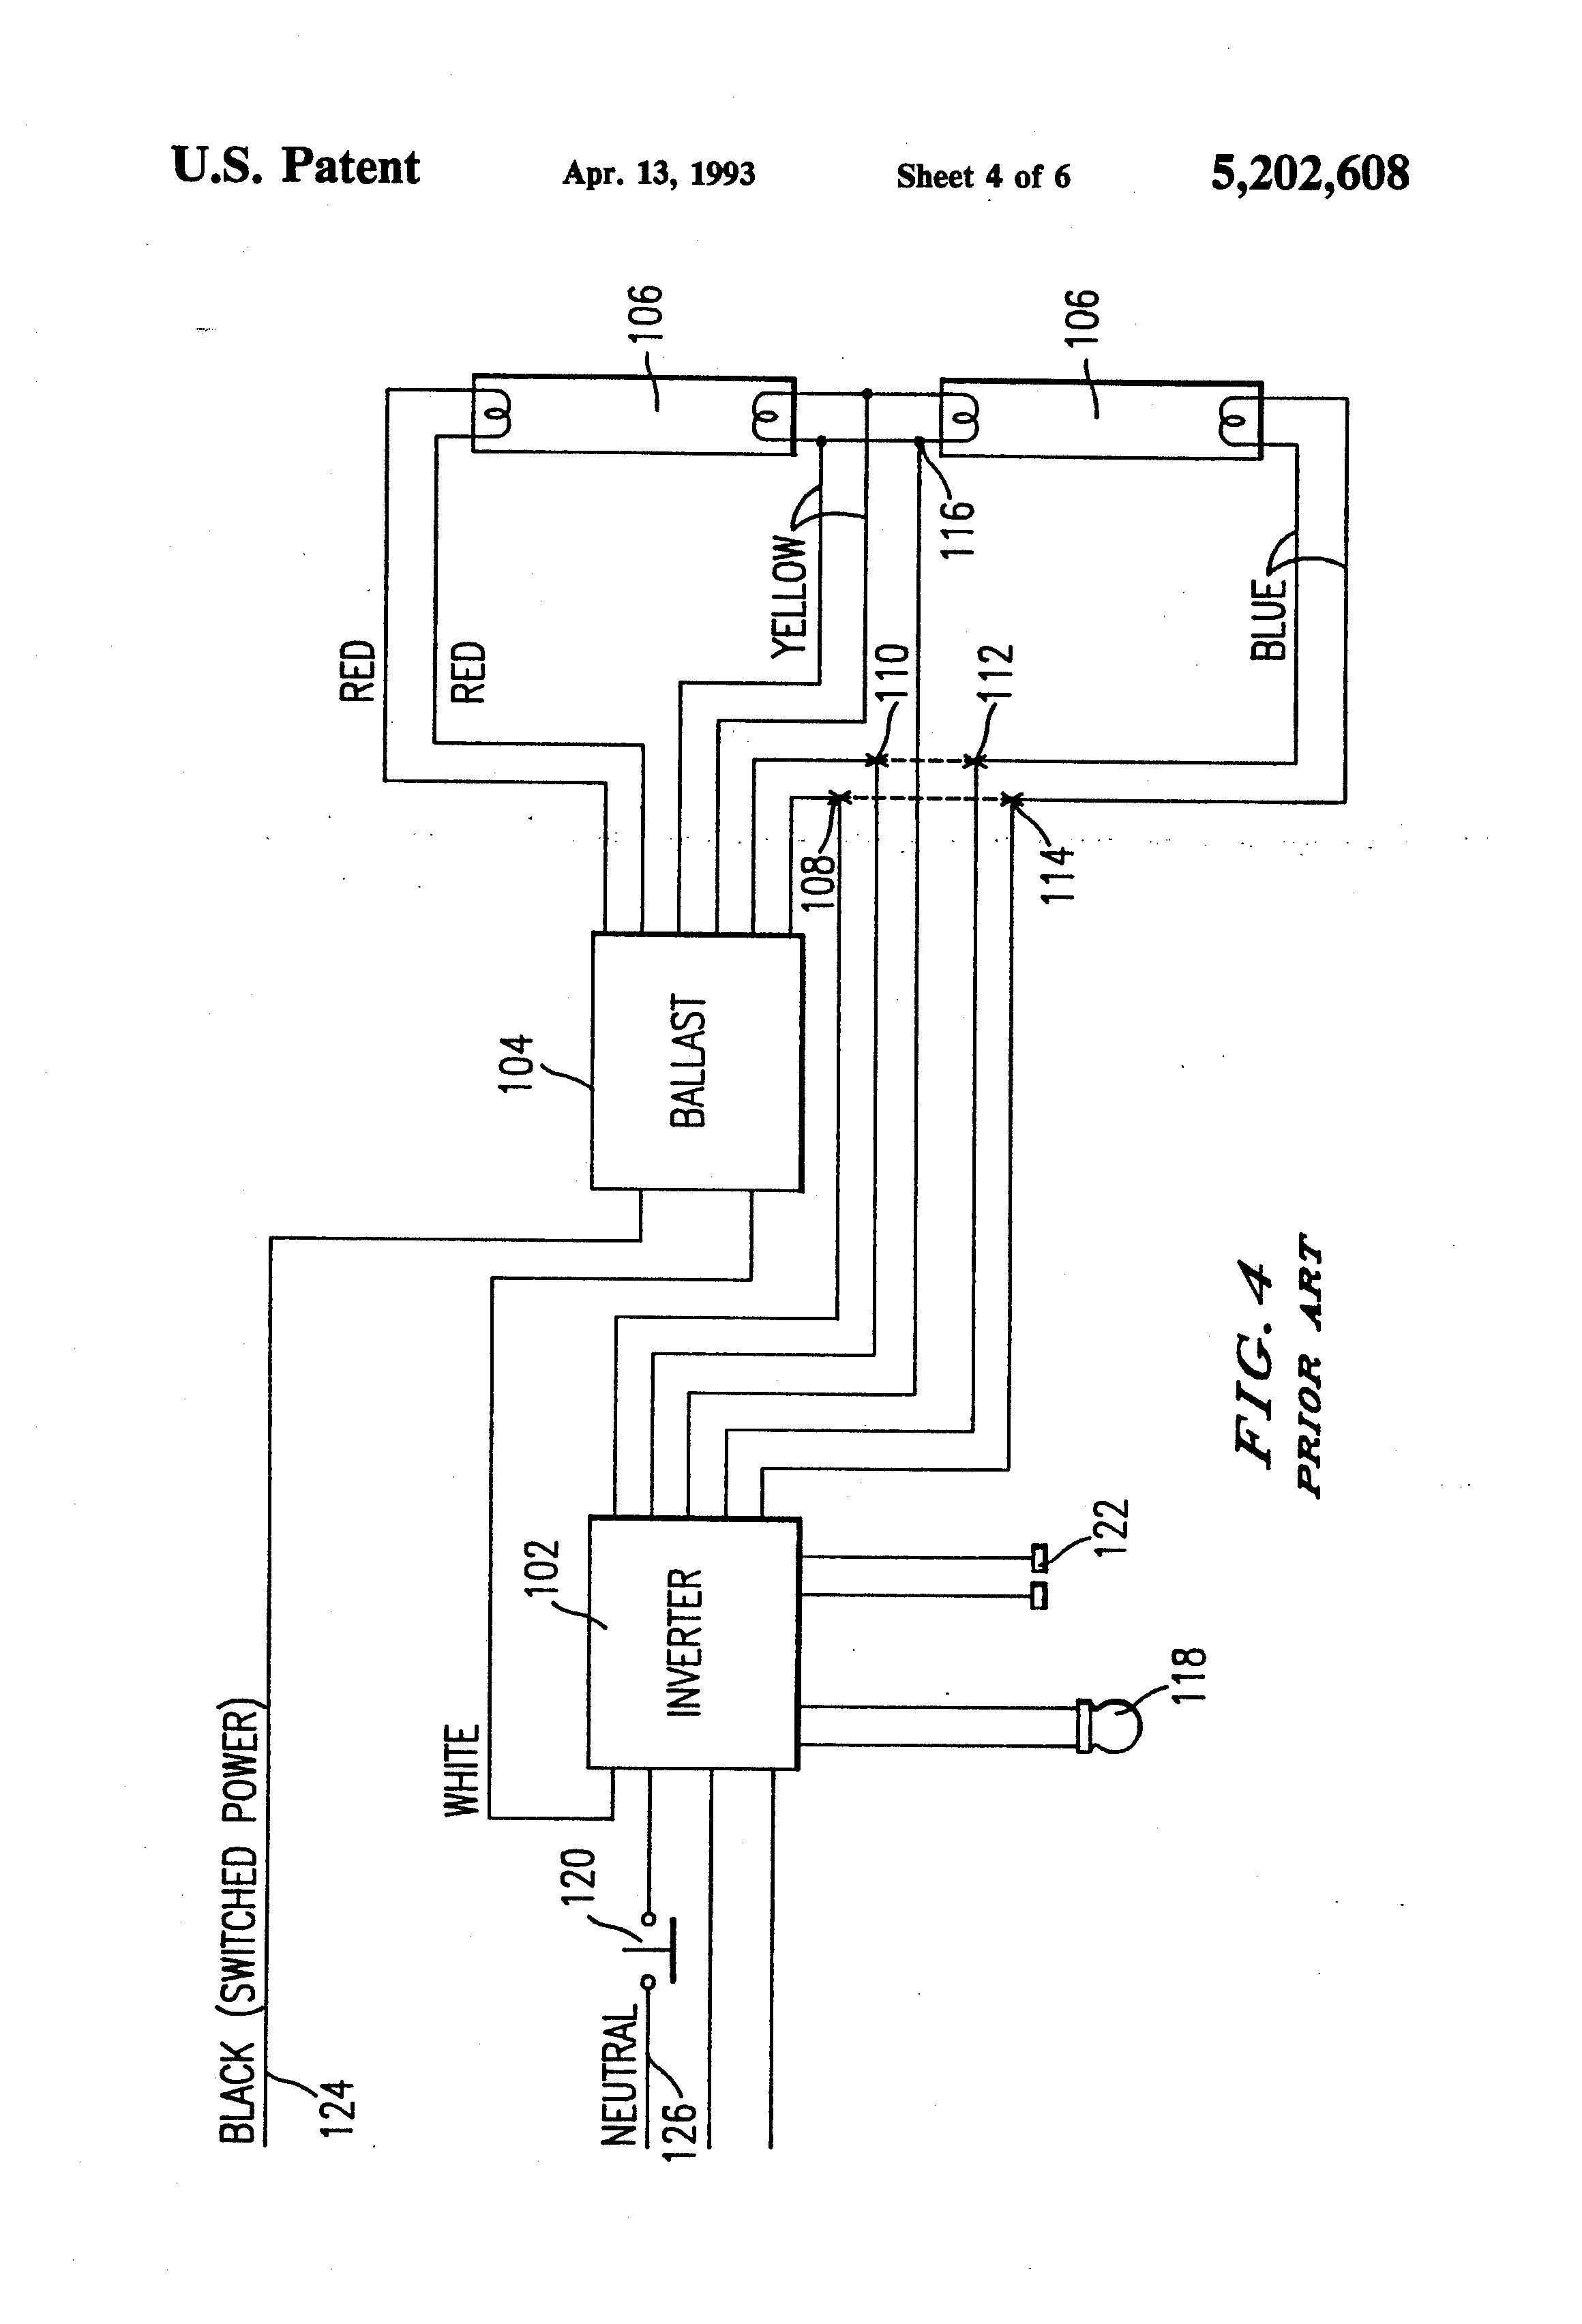 [QNCB_7524]  XO_6645] Photocell Sensor Wiring Diagram On Sodium Vapor Light Wiring  Diagram Schematic Wiring | Light Sensor Wiring Diagram 110 |  | Tacle Xolia Mohammedshrine Librar Wiring 101